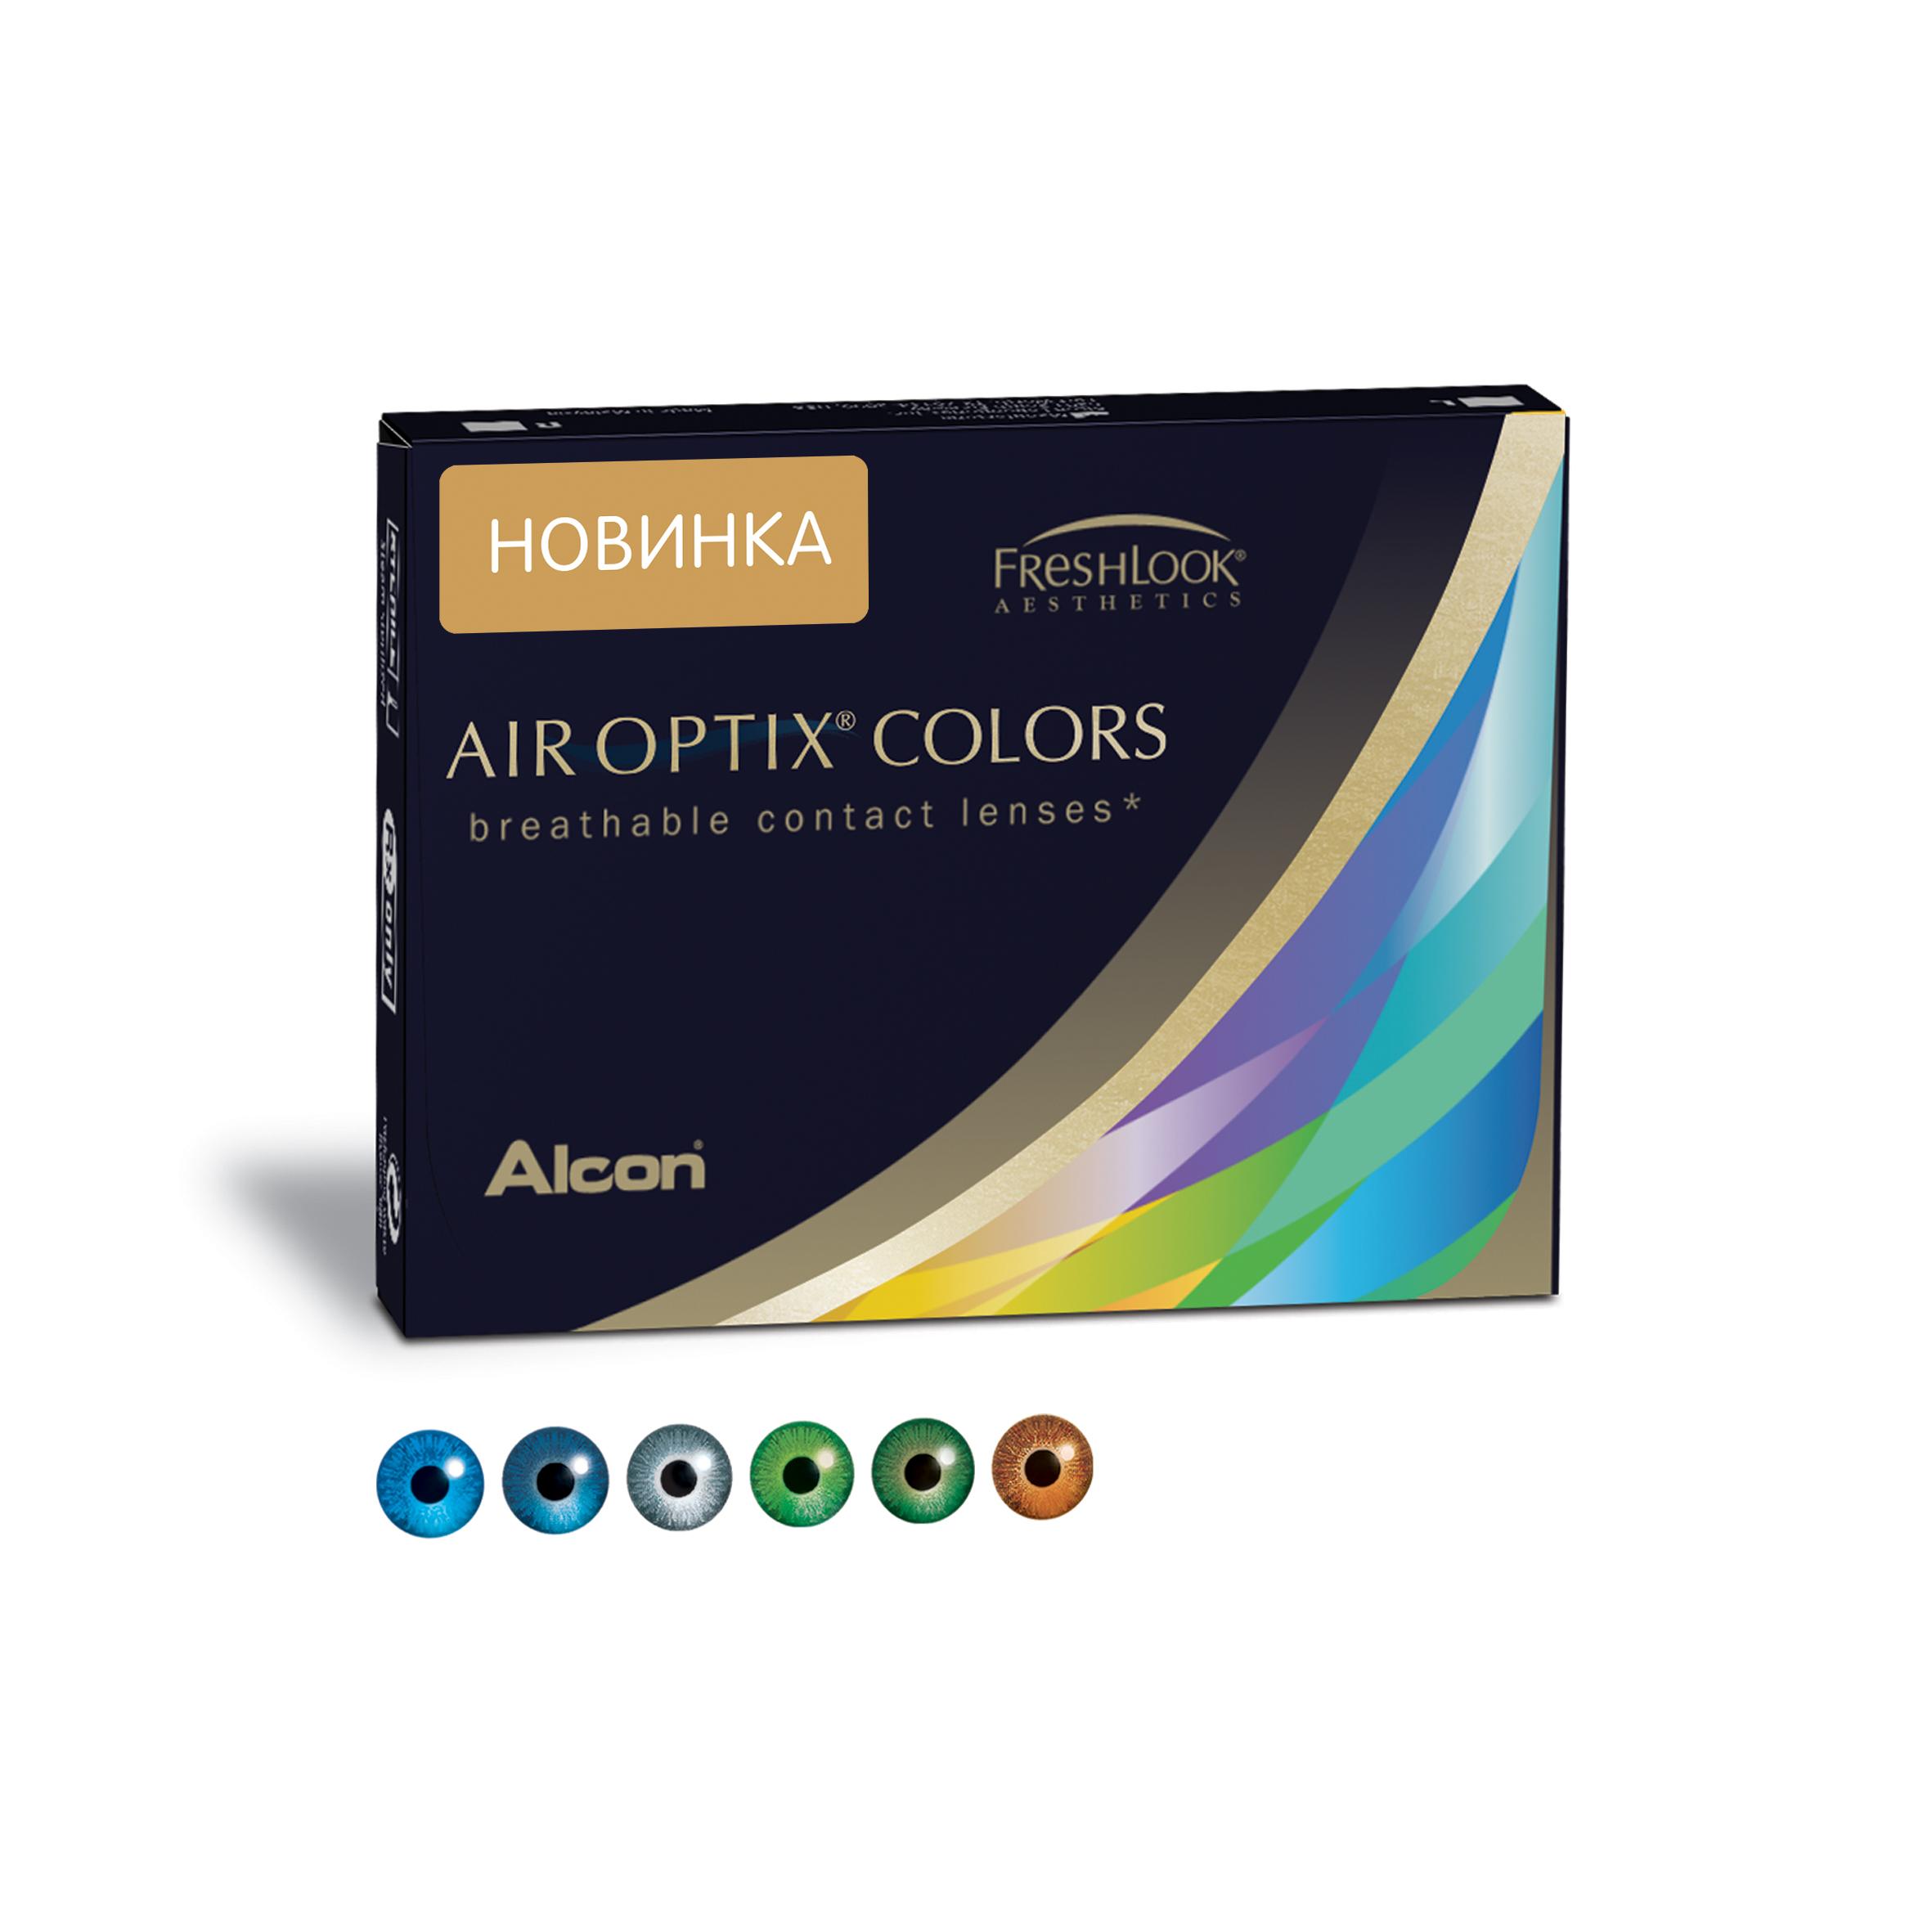 Аlcon контактные линзы Air Optix Colors 2 шт -2.75 Green31746189Мягкие контактные линзы